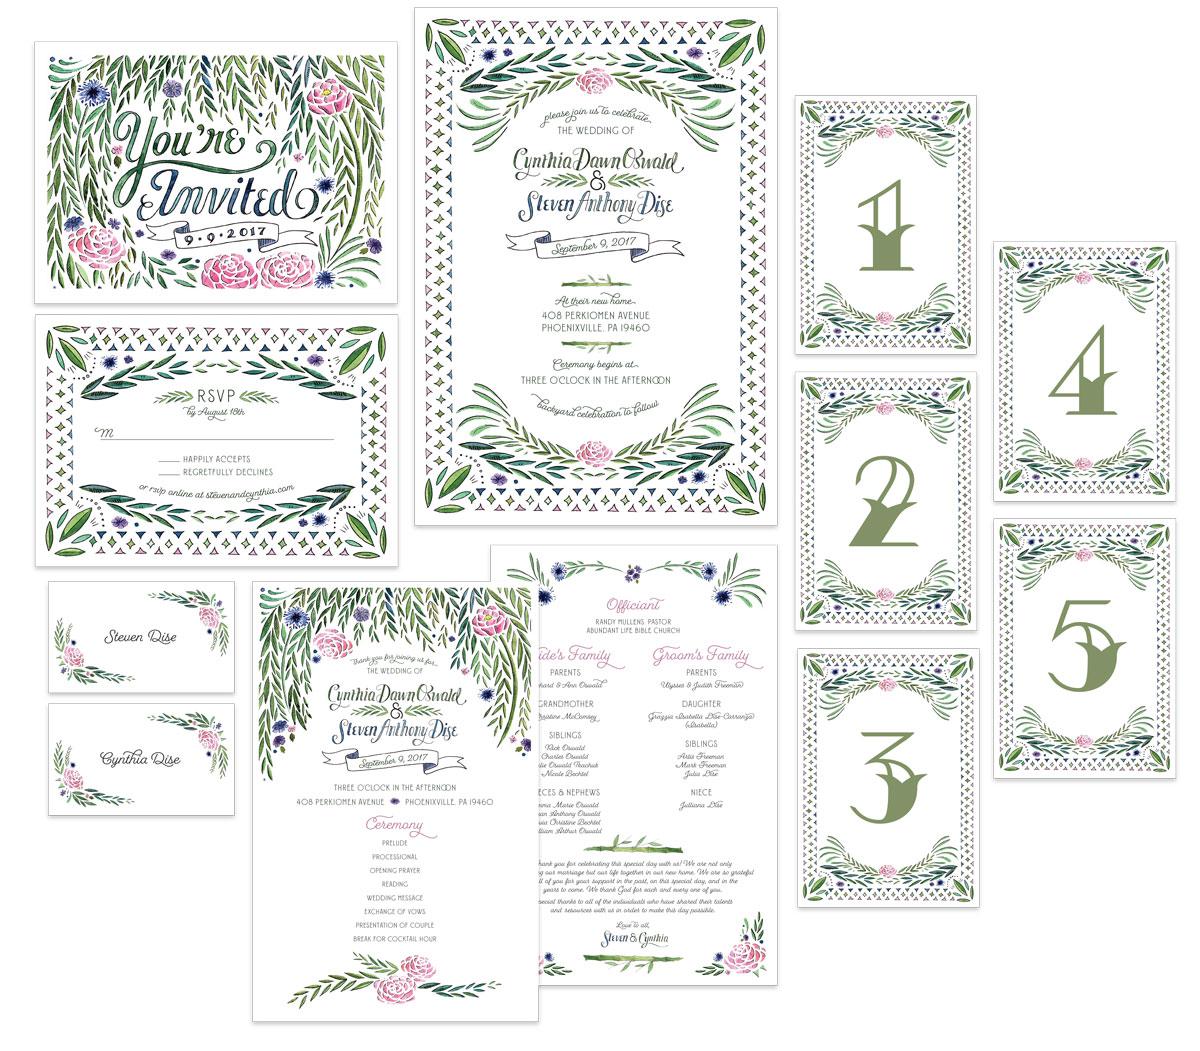 Cynthia Oswald design